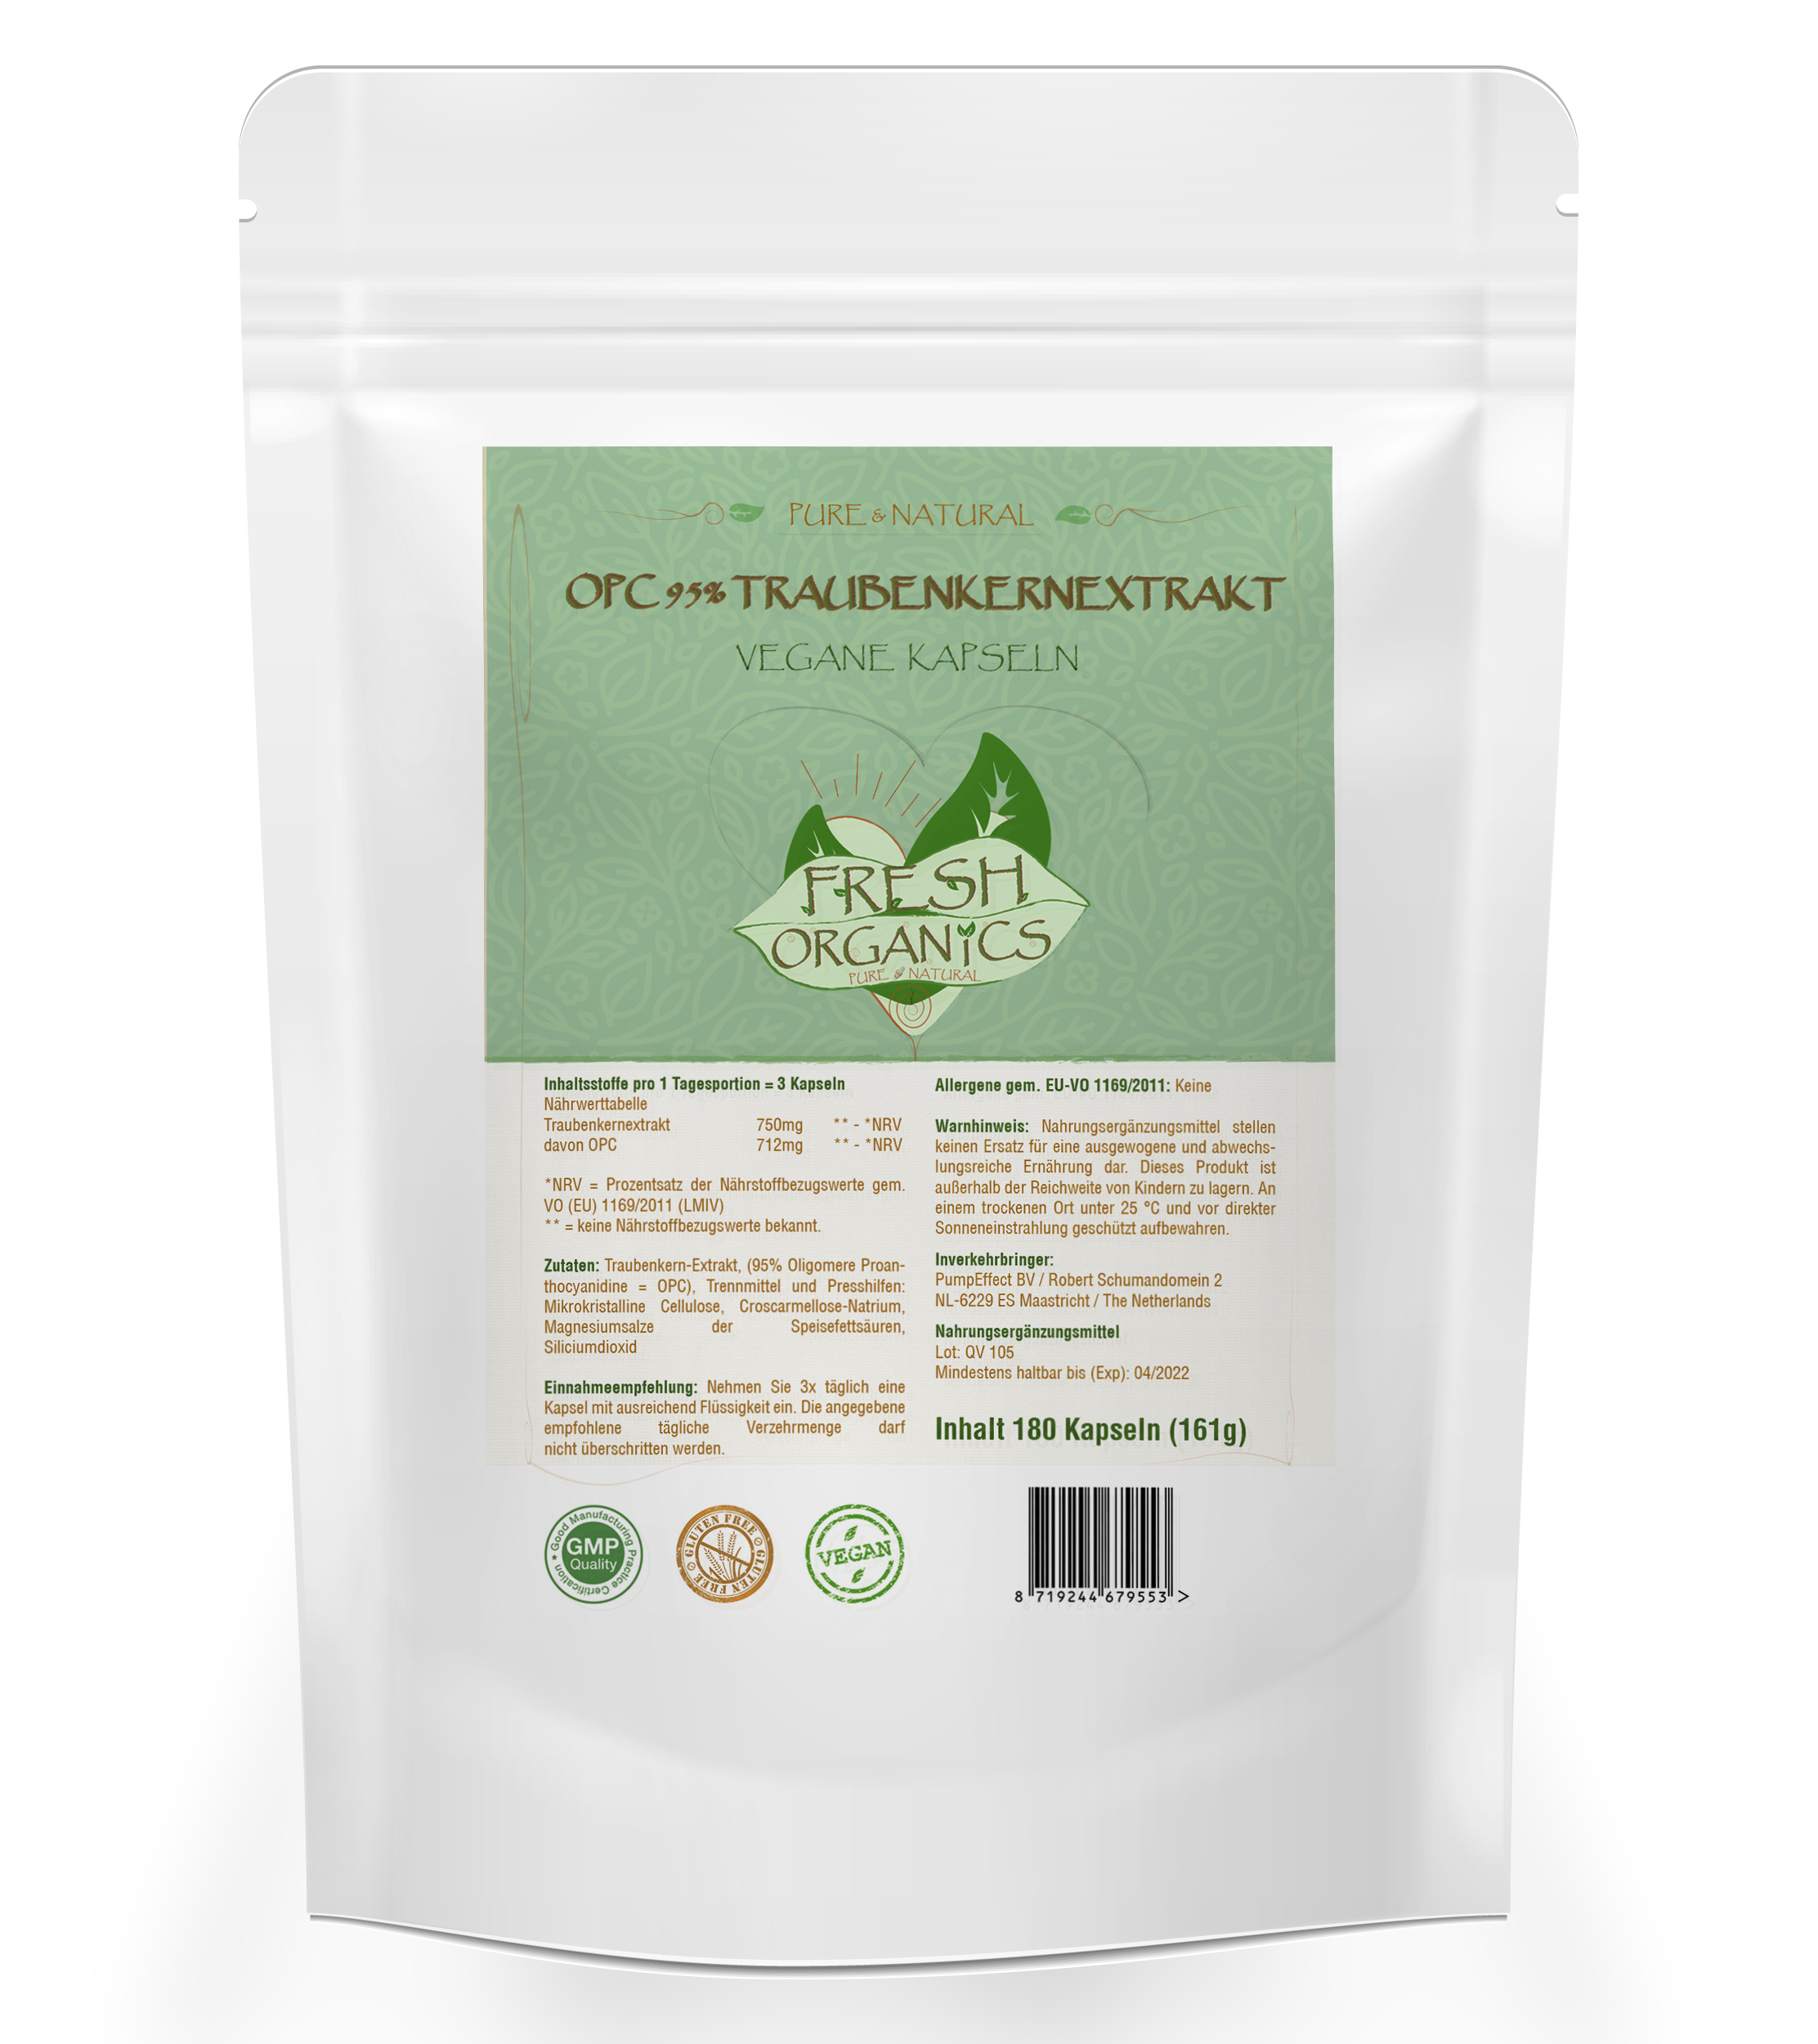 OPC Traubenkernextrakt Kapseln - Hochdosiert & Vegan